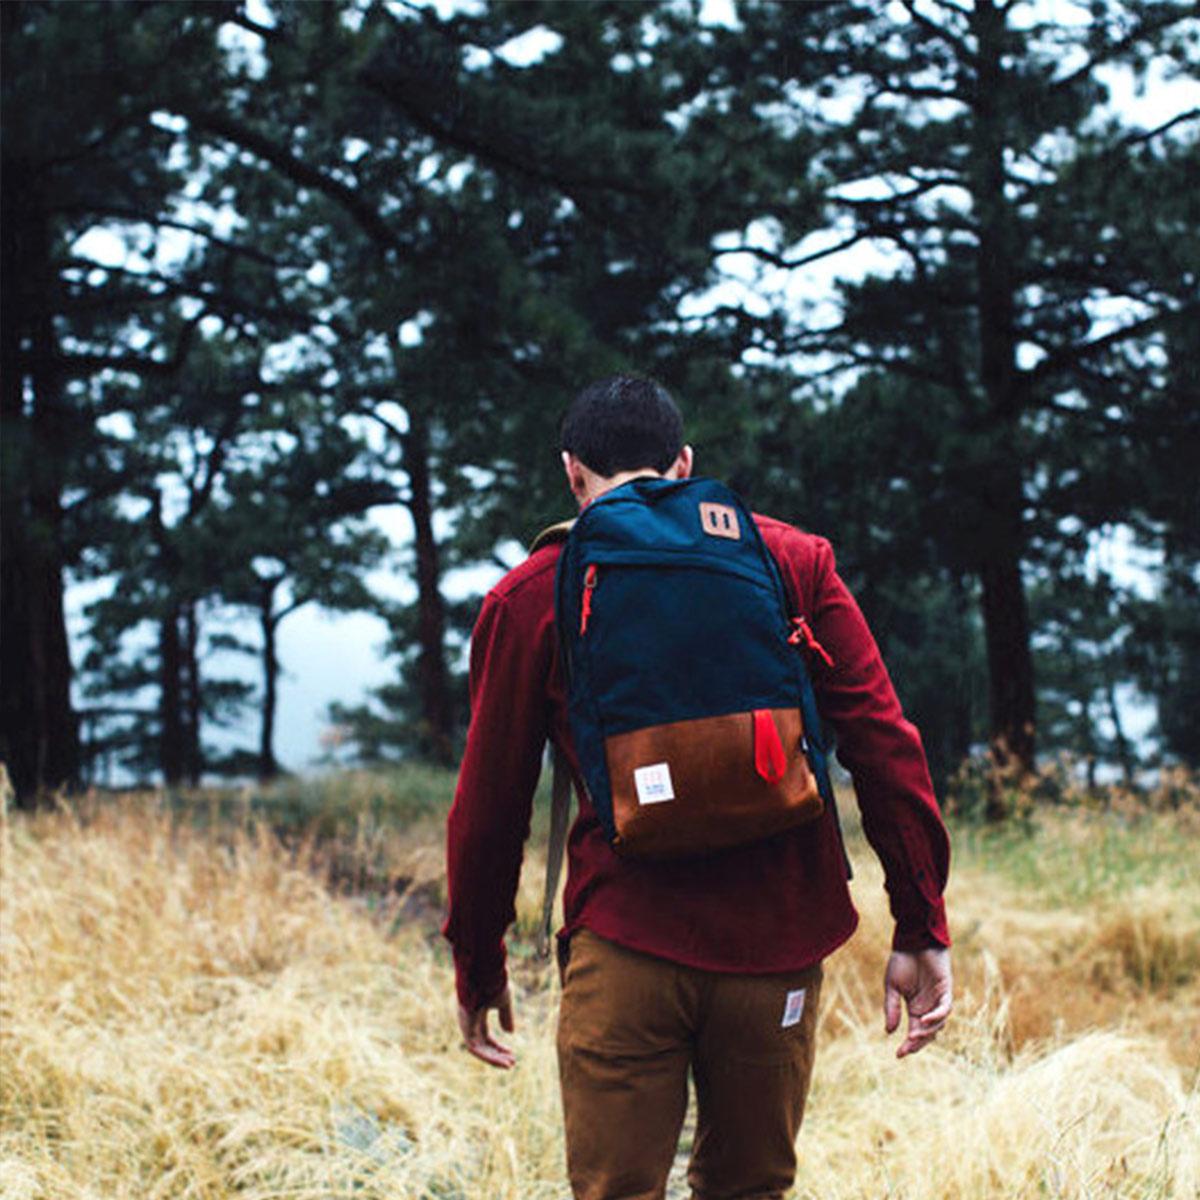 Topo Designs Daypack Navy/Brown Leather, idealer Reisebegleiter, Arbeitskollege oder Packesel